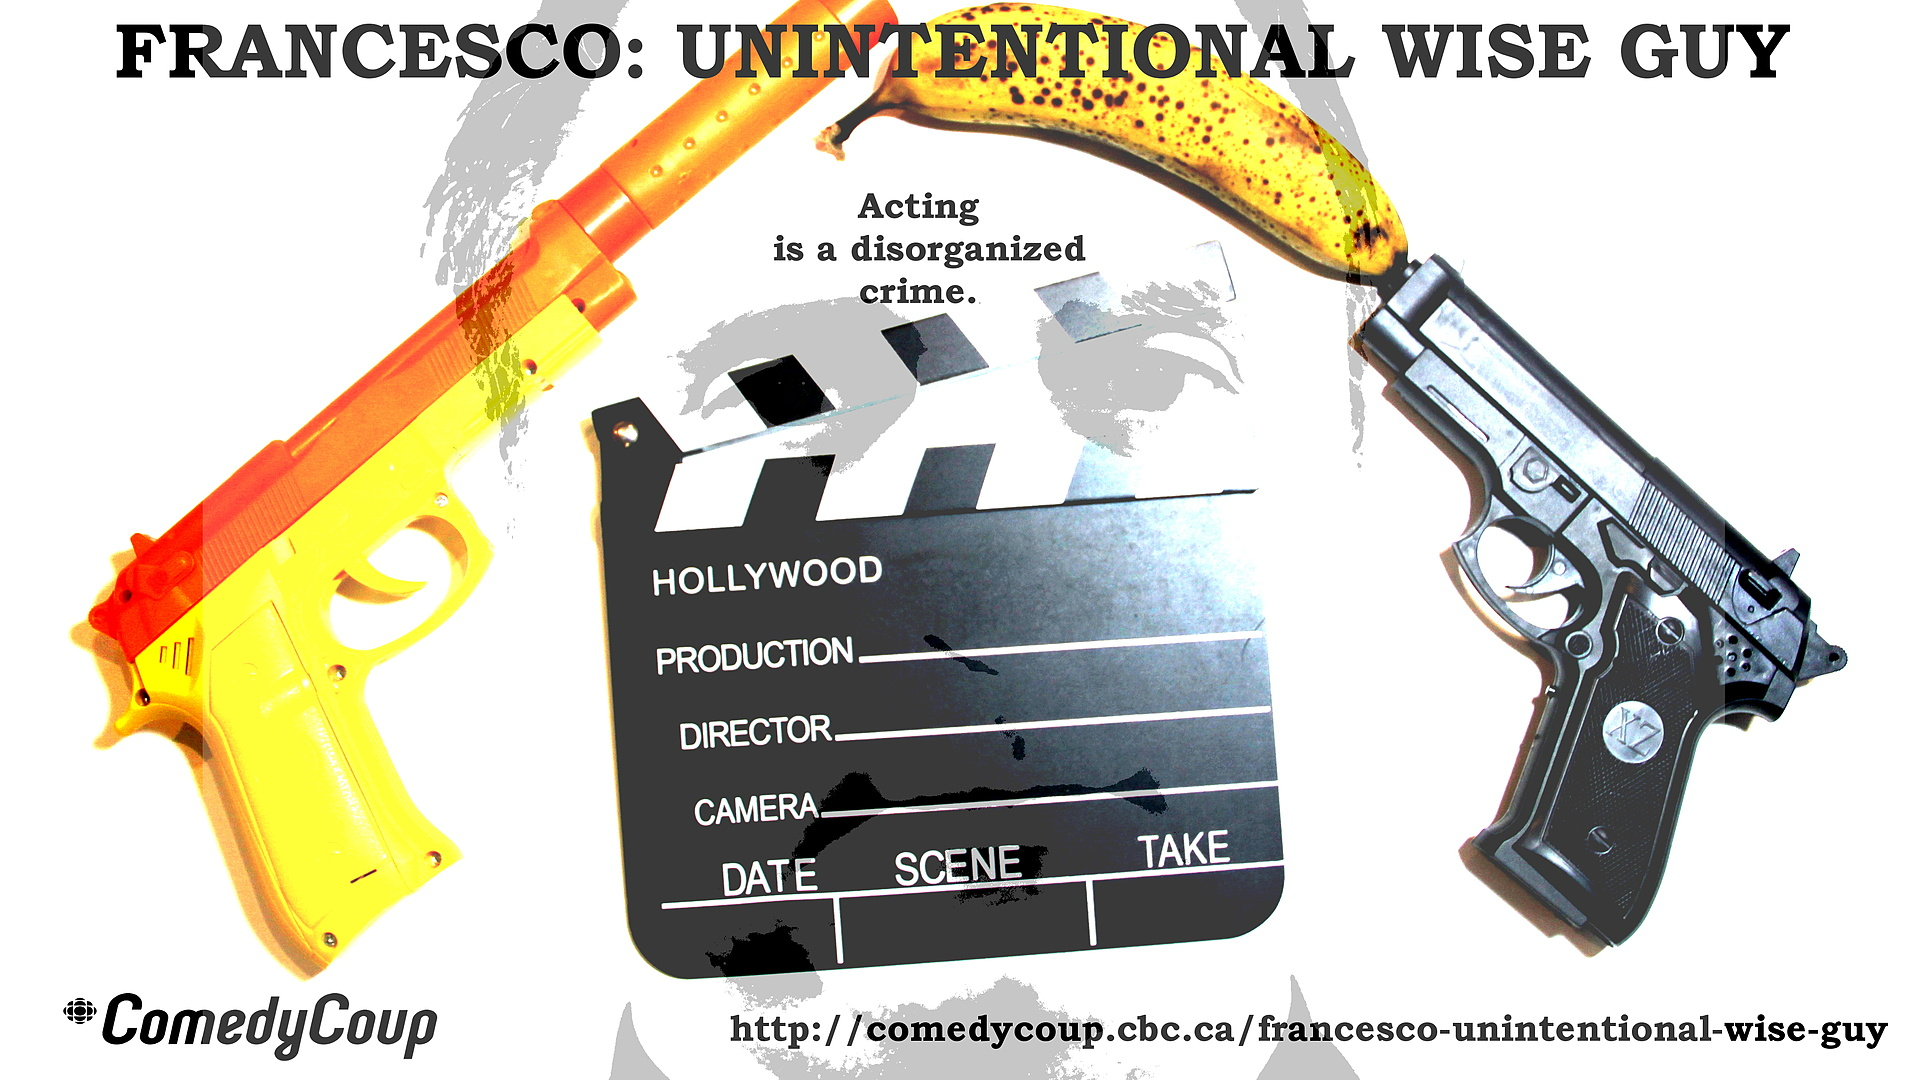 Week 4 Key It: Poster B Francesco: Unintentional Wise Guy